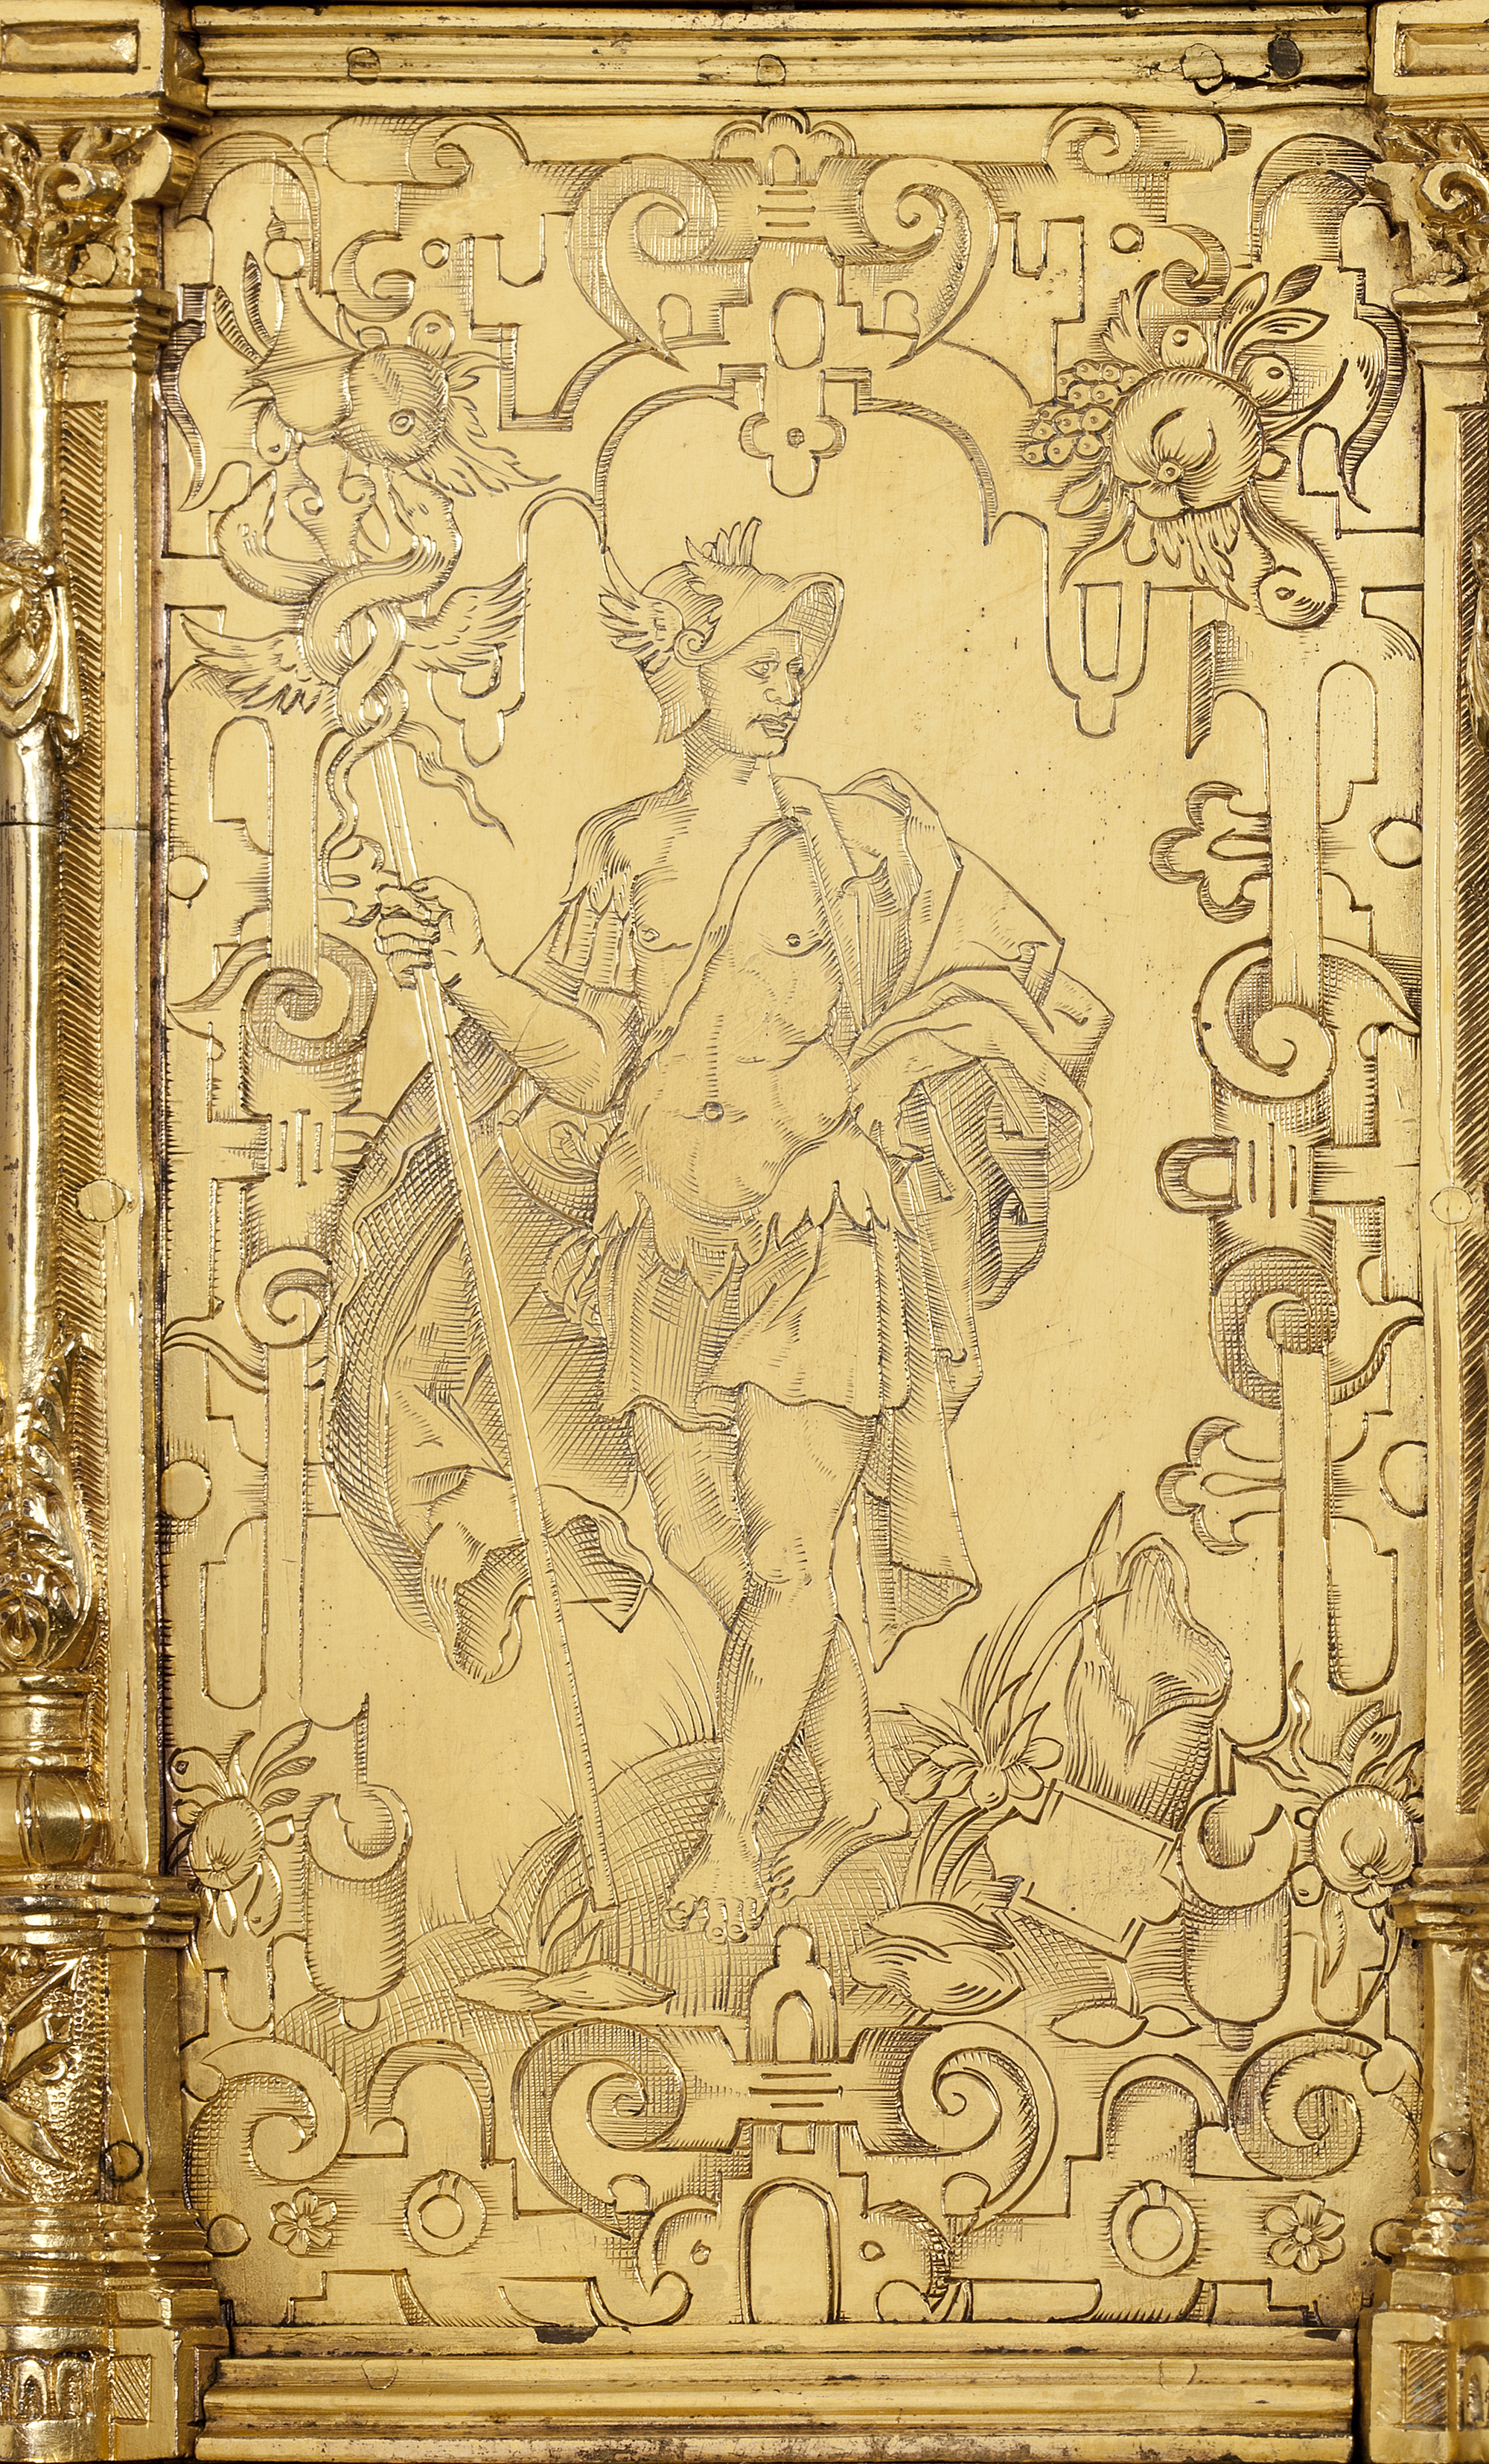 Exelent Renaissance Wall Decor Illustration - The Wall Art ...